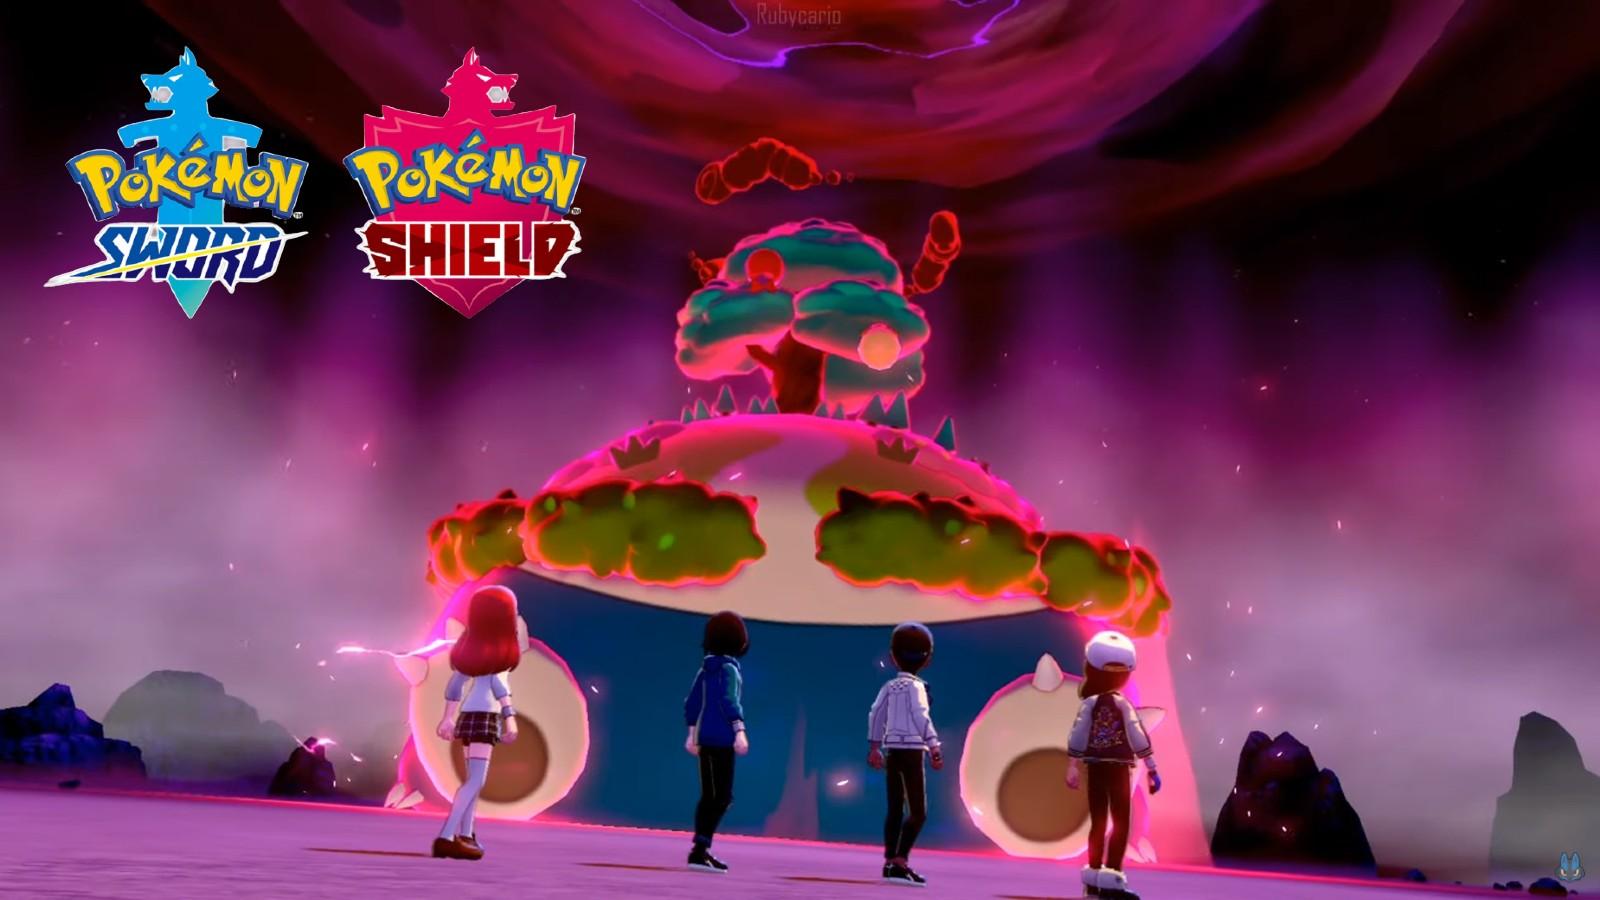 Pokemon Sword and Shield raid battle